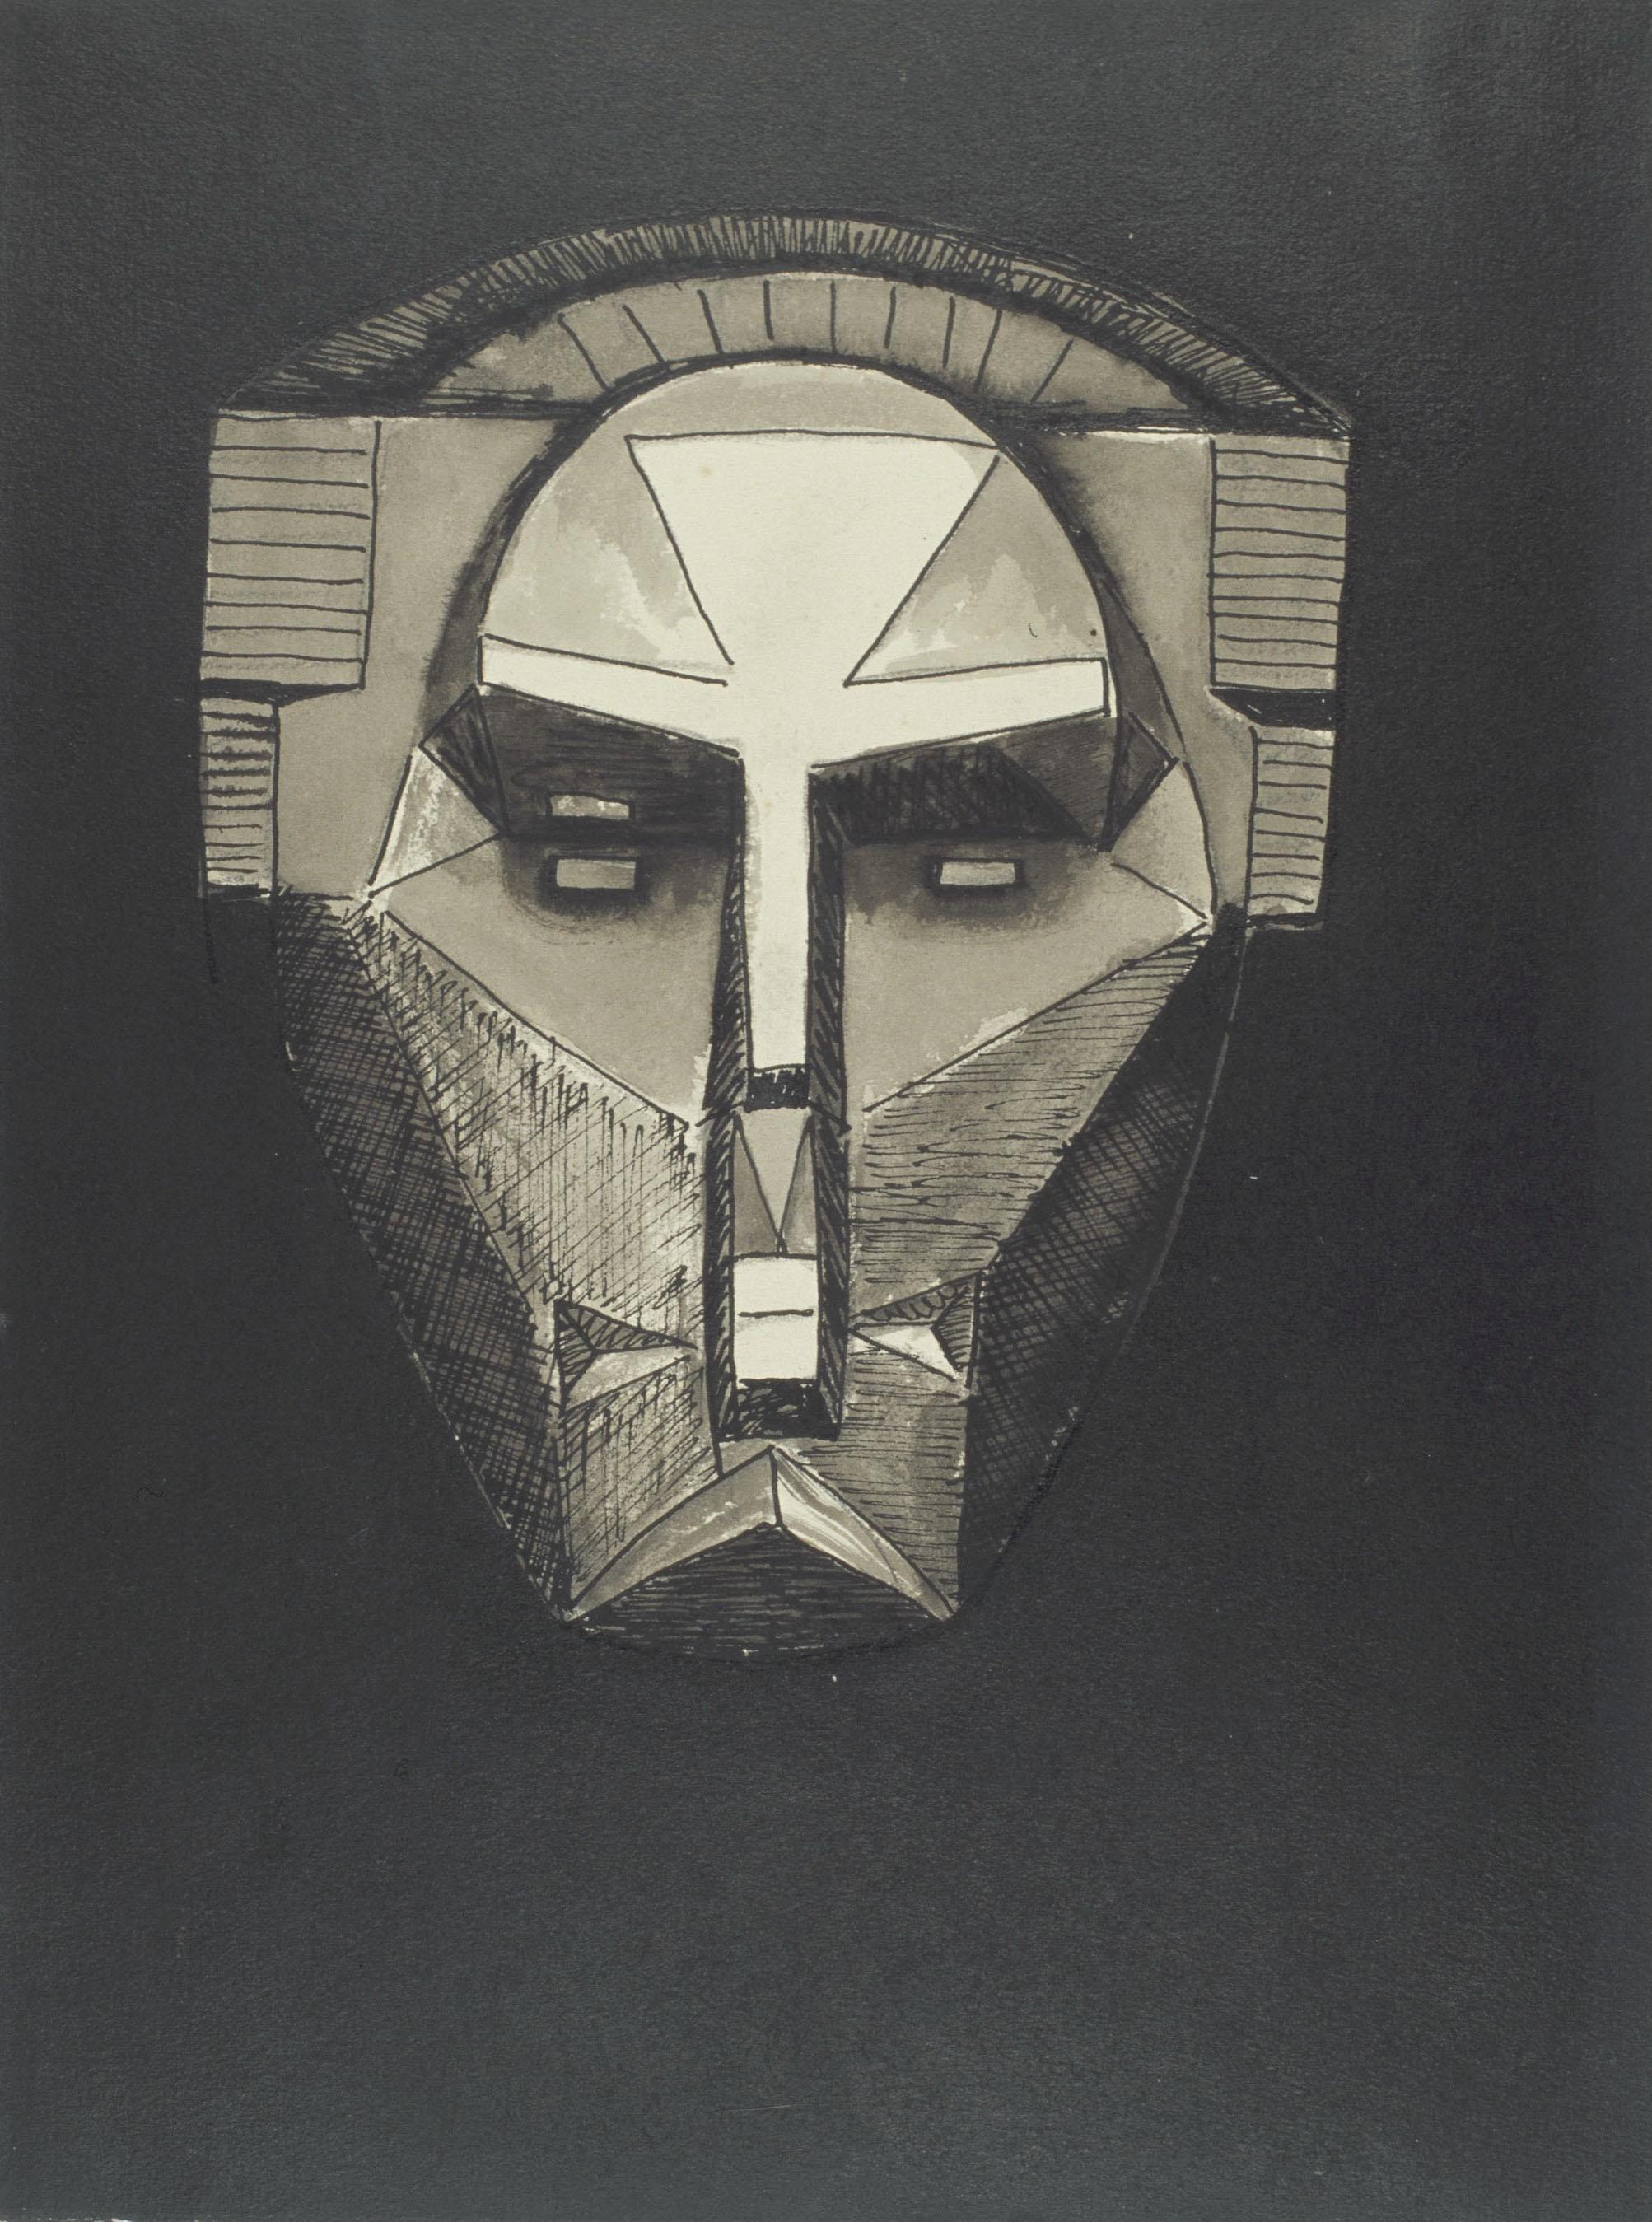 Juli González - Màscara terrible (Masque terrible) - 1940